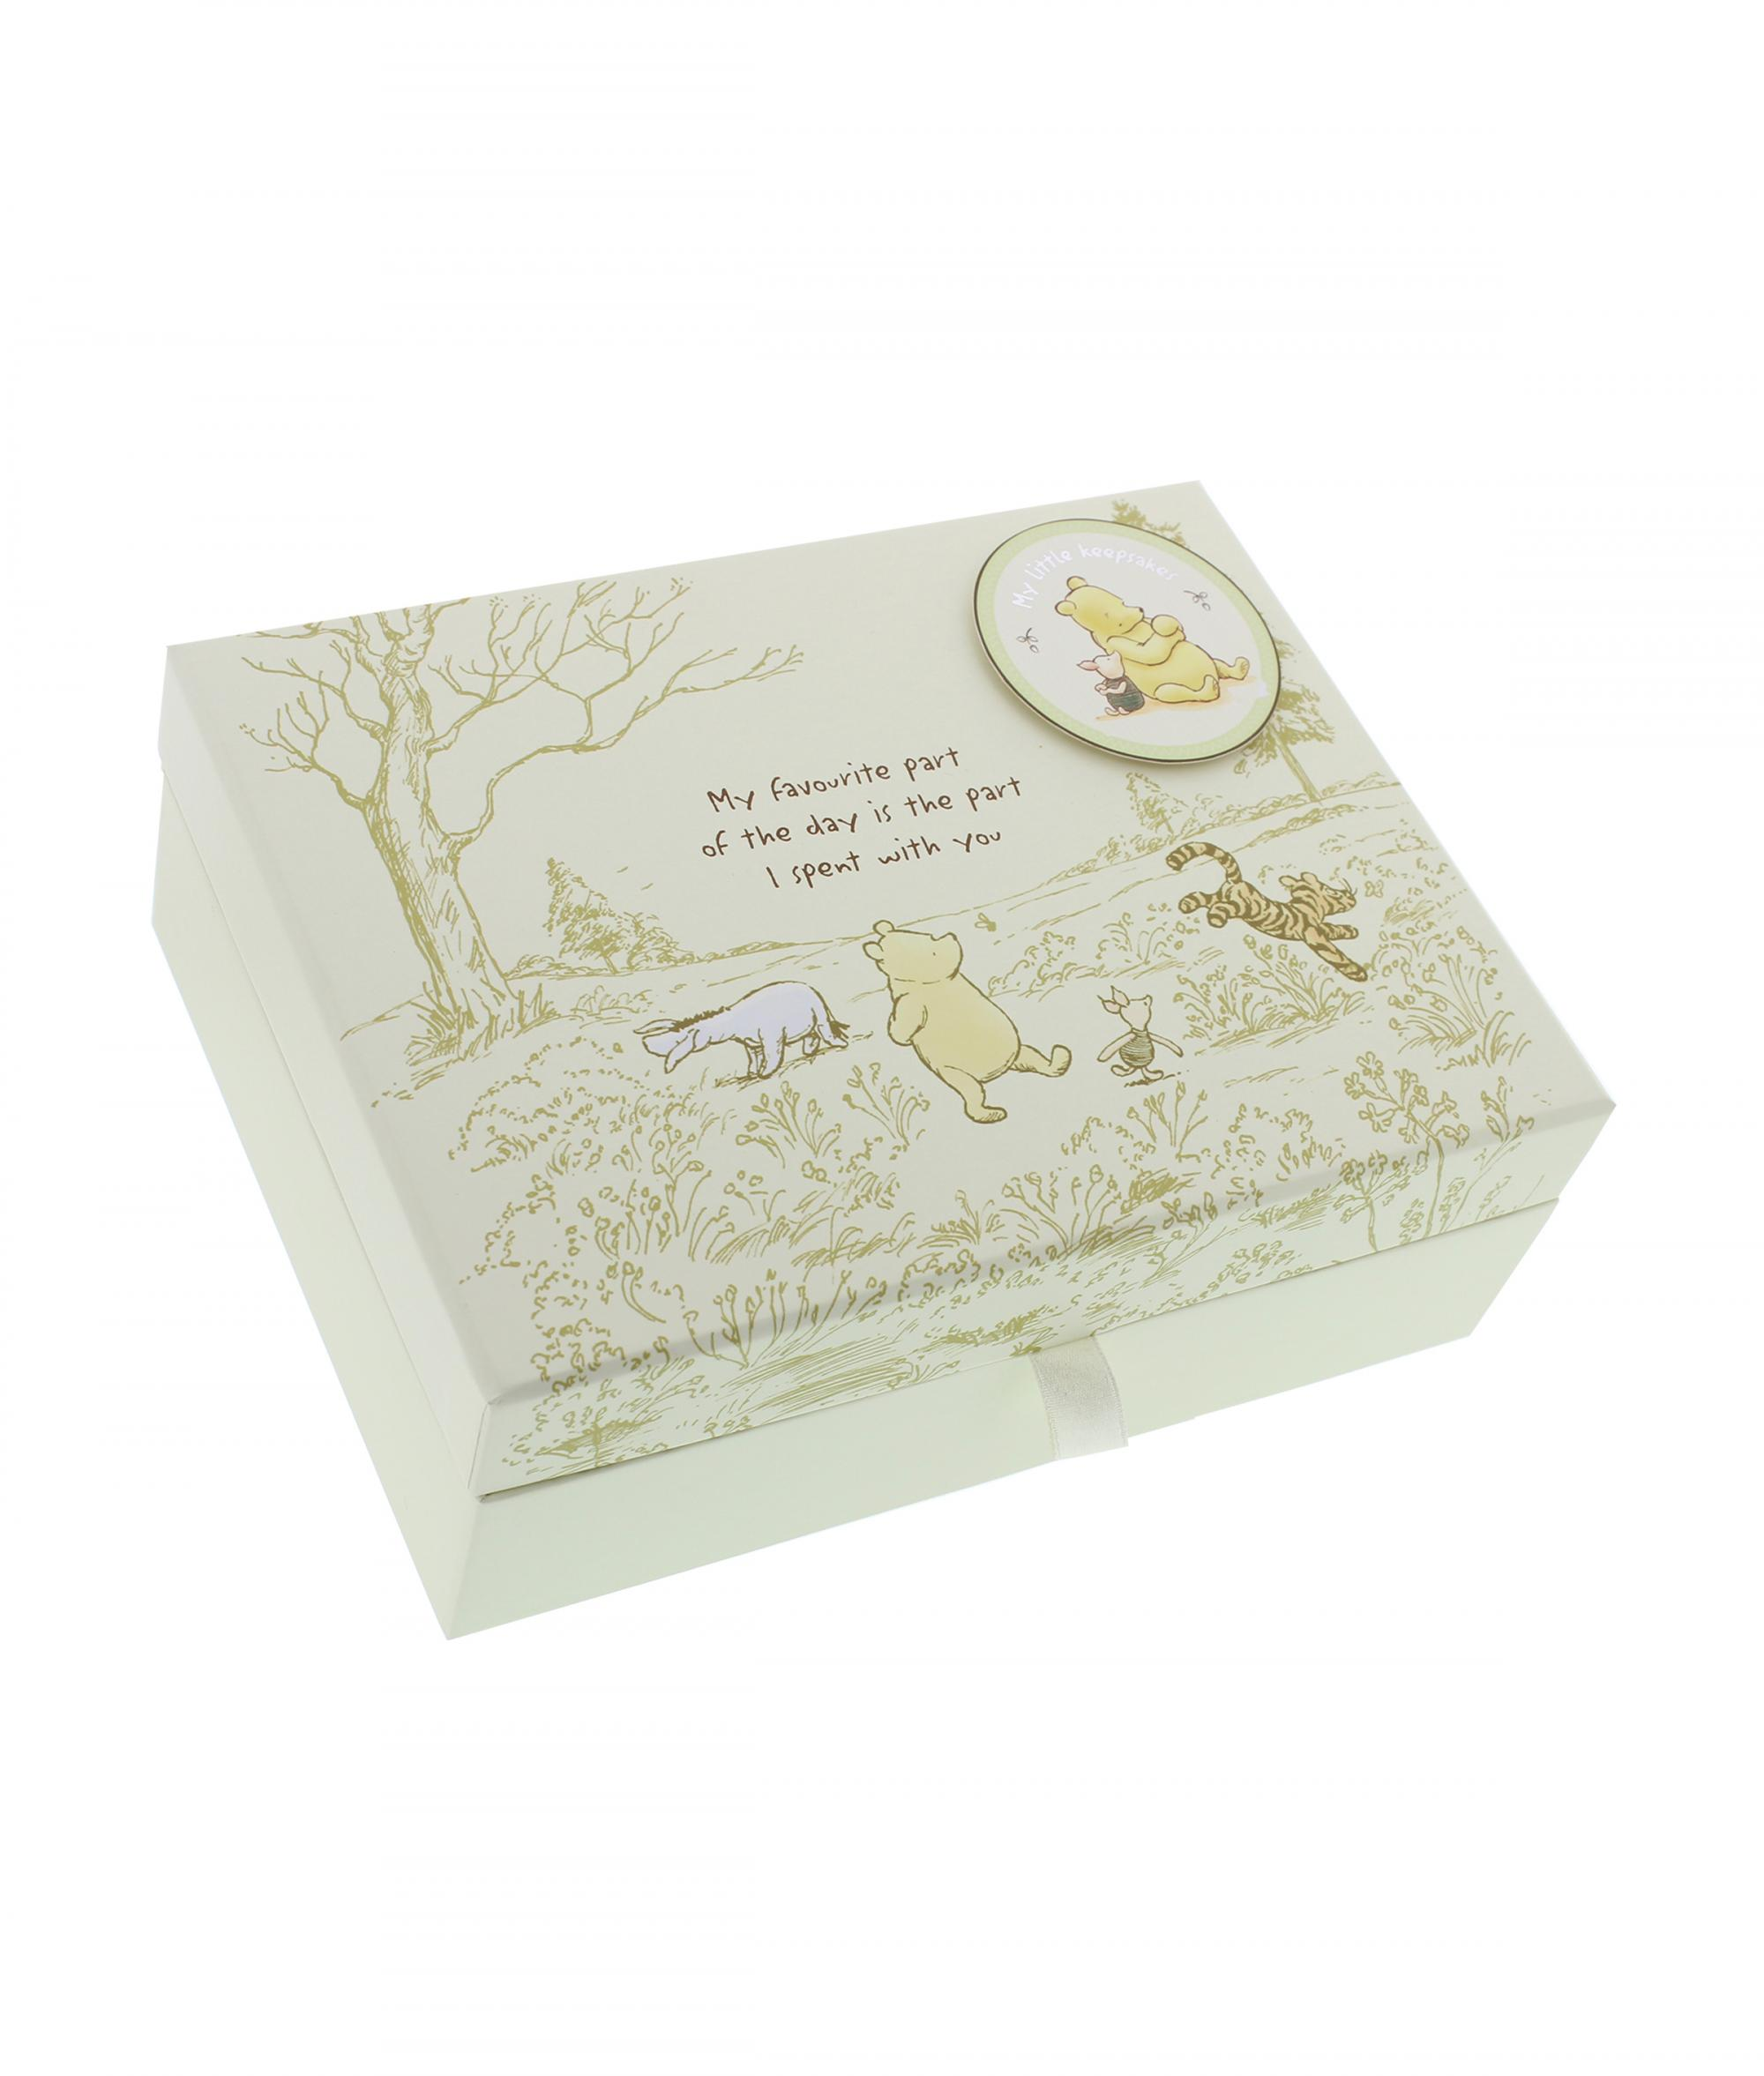 Disney Baby Gifts Uk : Disney classic pooh heritage keepsake box